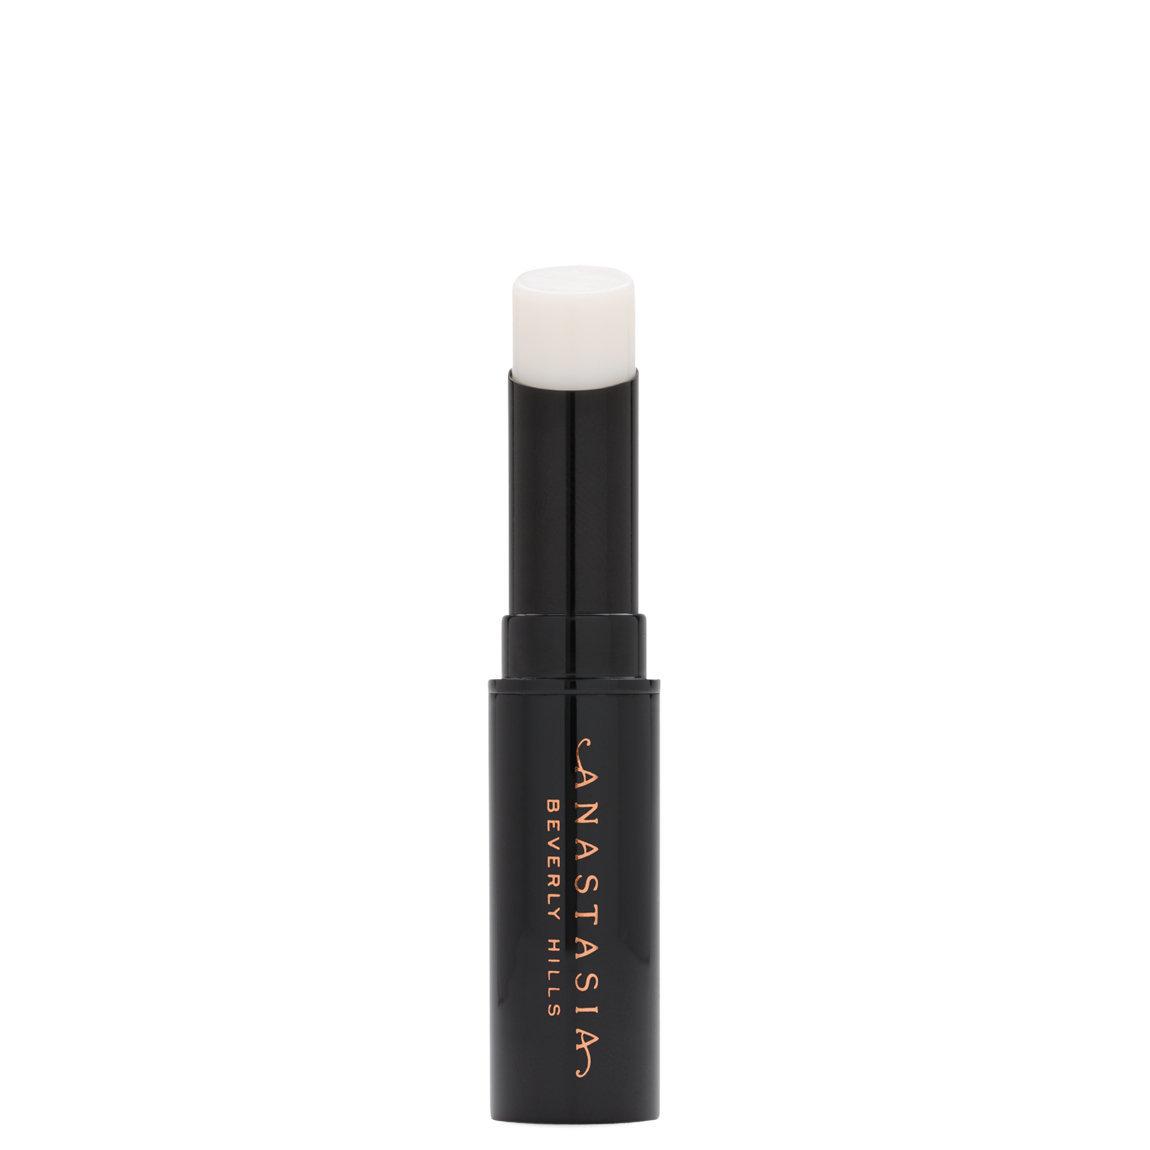 Anastasia Beverly Hills Lip Primer alternative view 1 - product swatch.